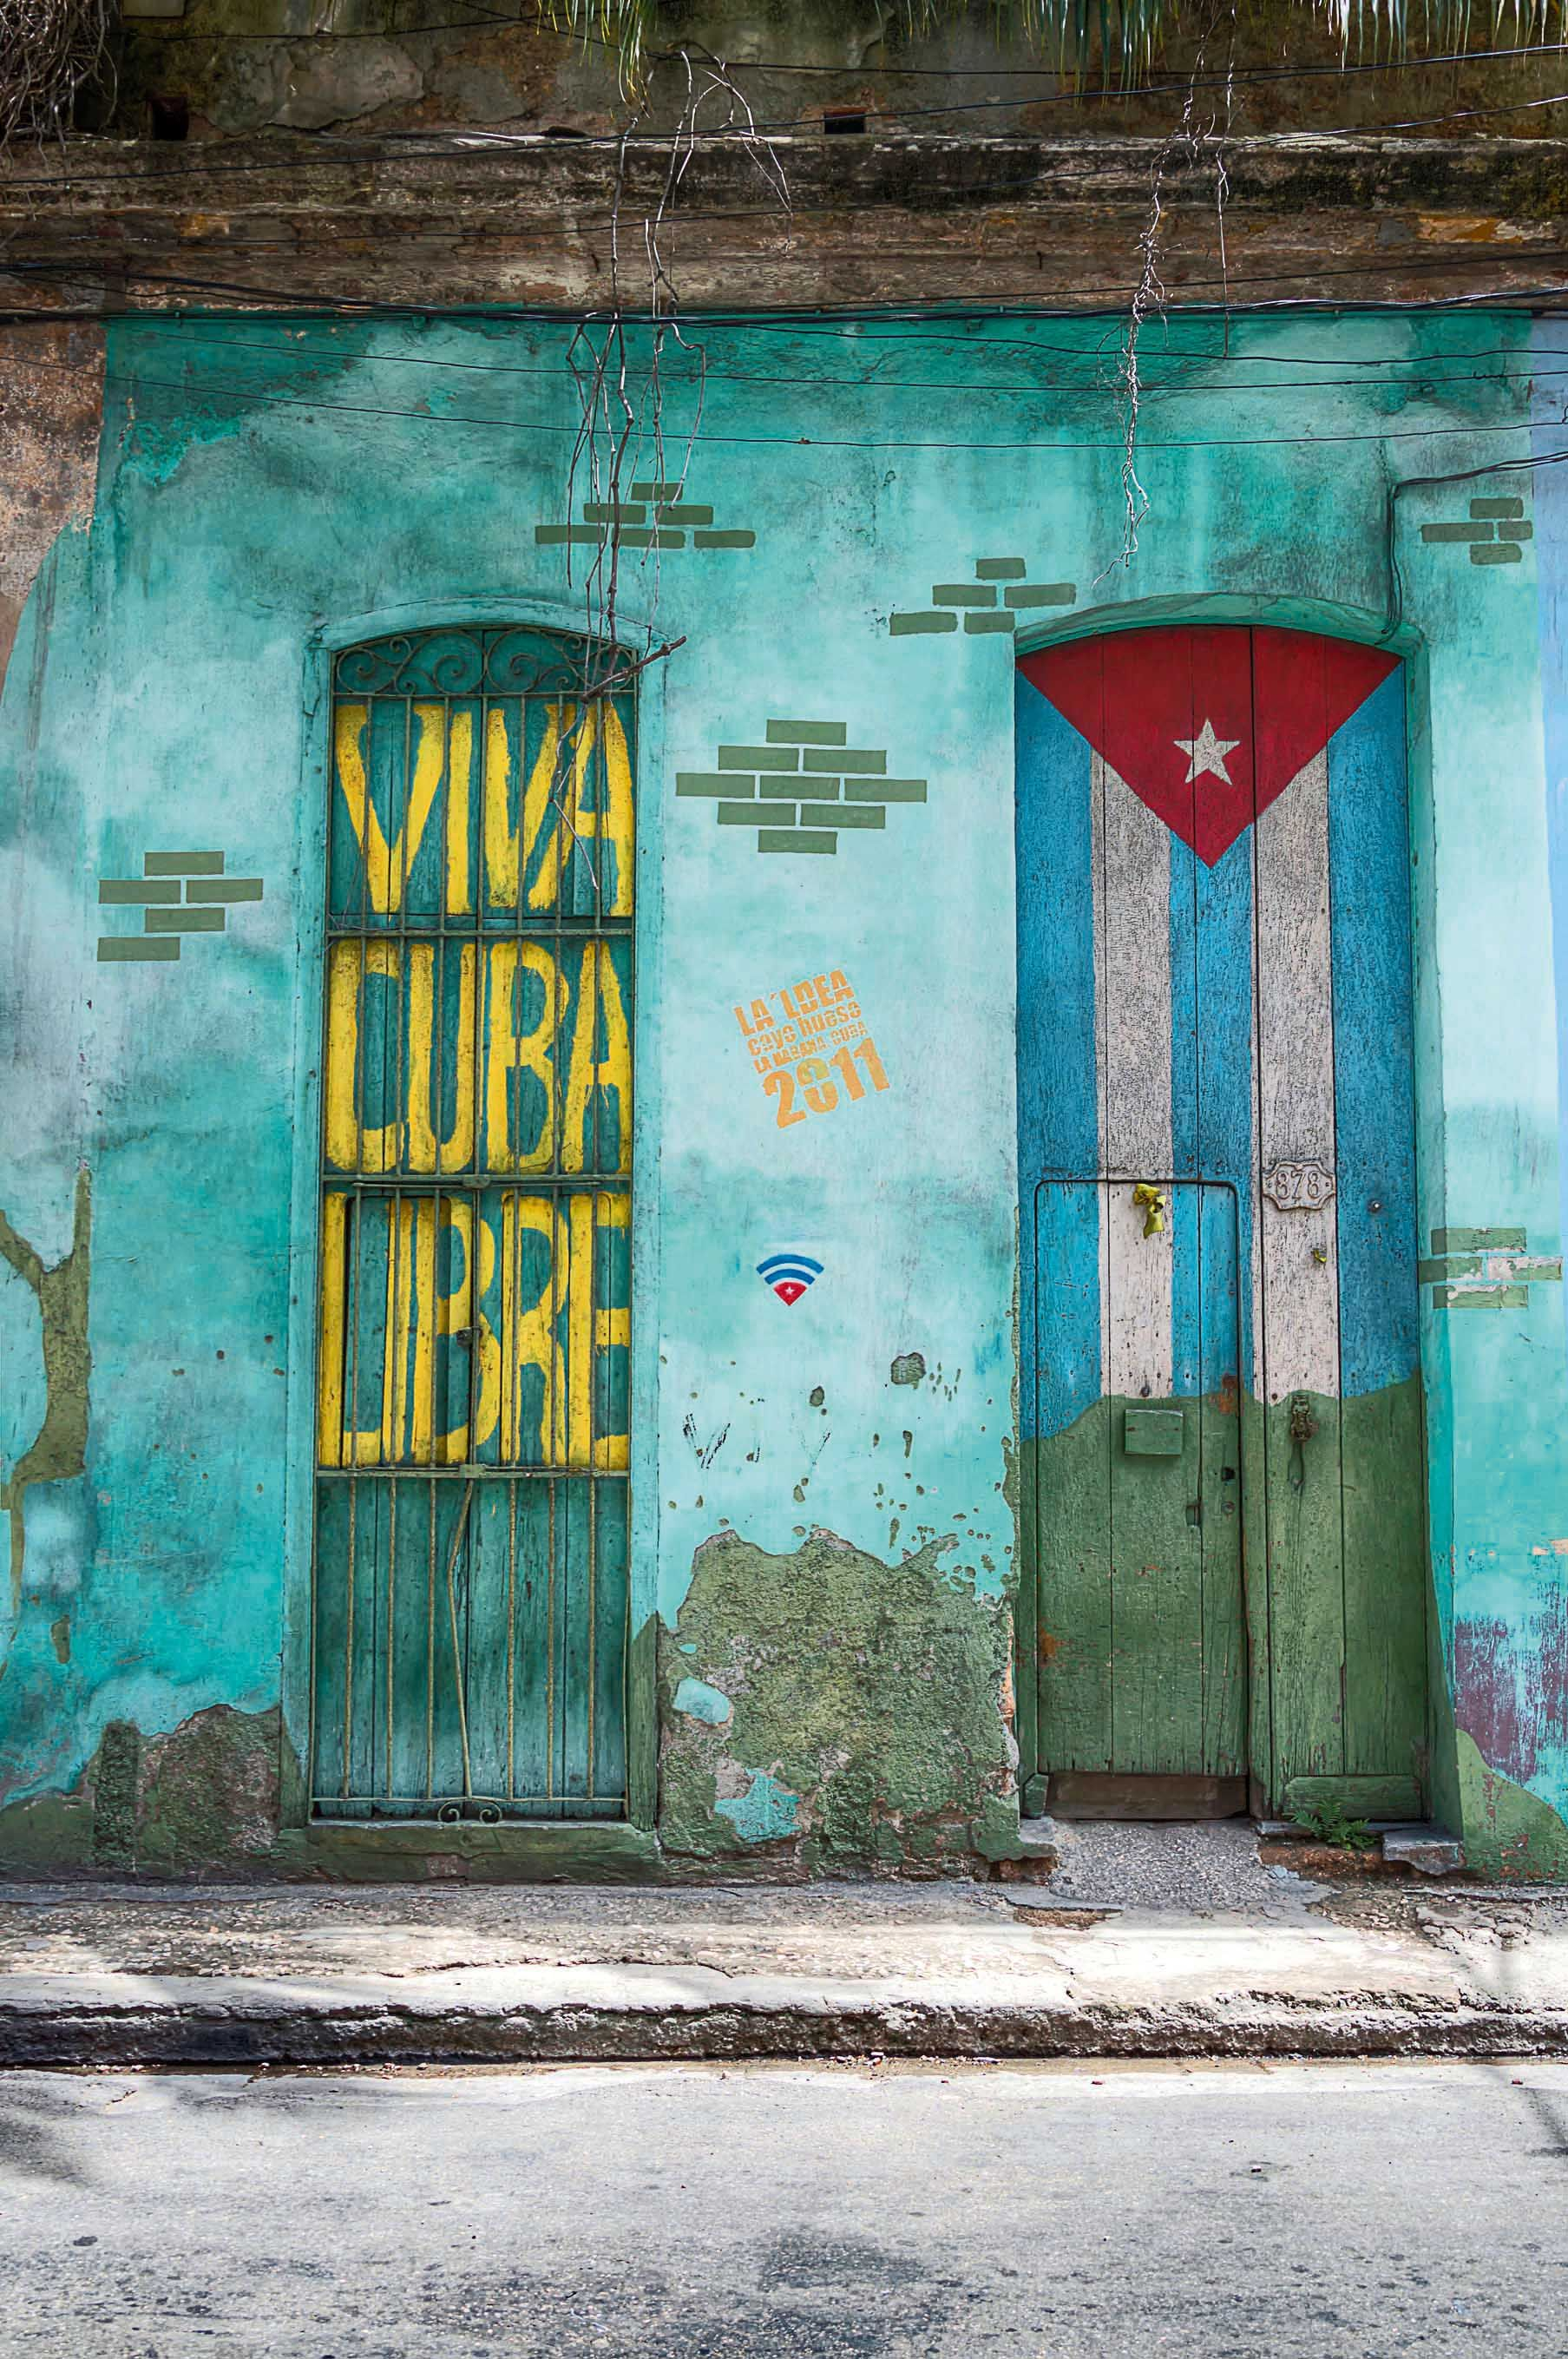 RA August 2016. Time to visit Cuba. Patriotic graffiti. PHOTO: istock #royalauto #cuba #havanacuba #visitcuba